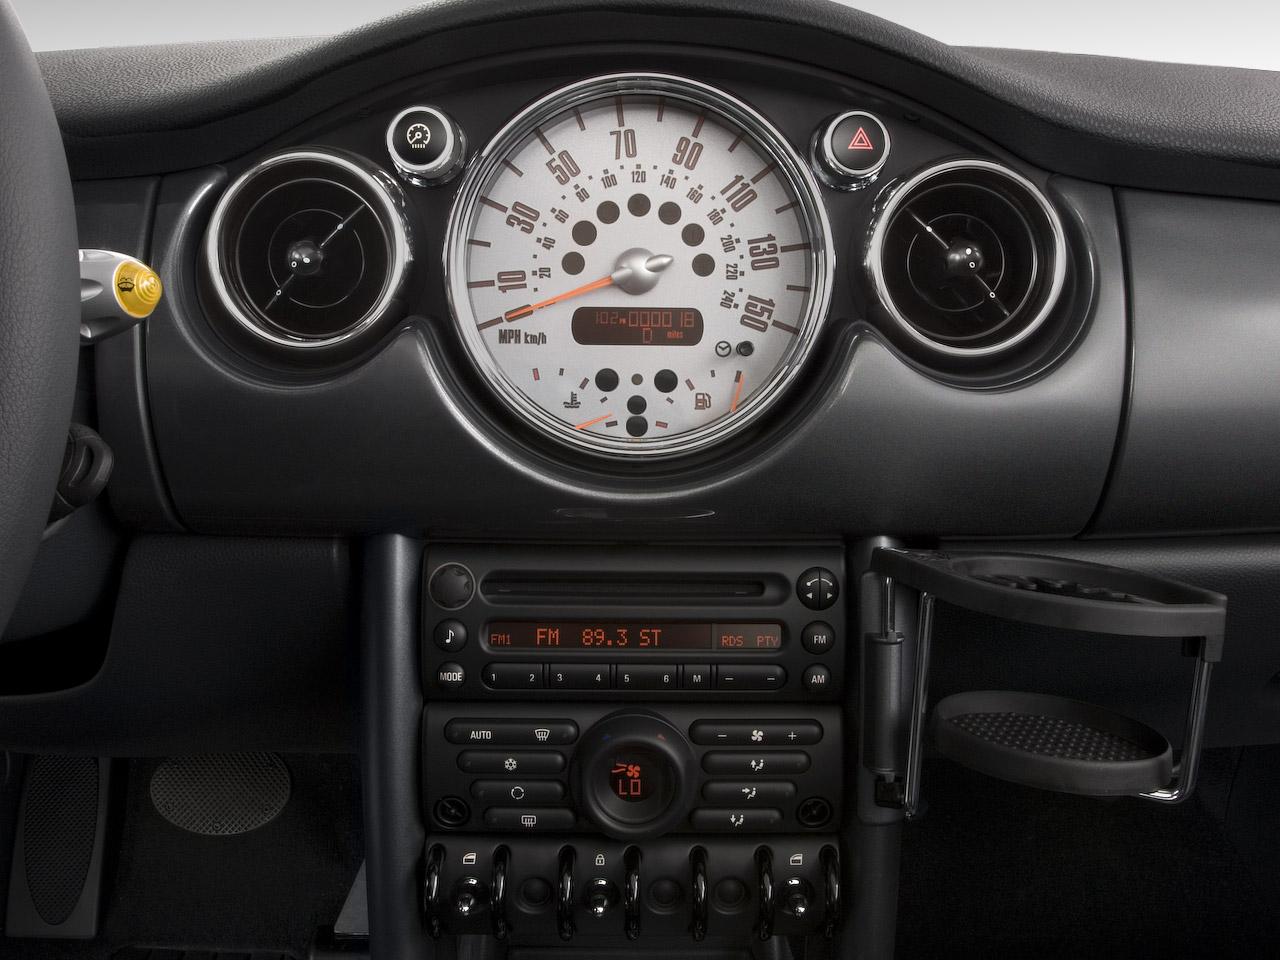 2007 mini cooper s latest news features auto reviews automobile magazine. Black Bedroom Furniture Sets. Home Design Ideas